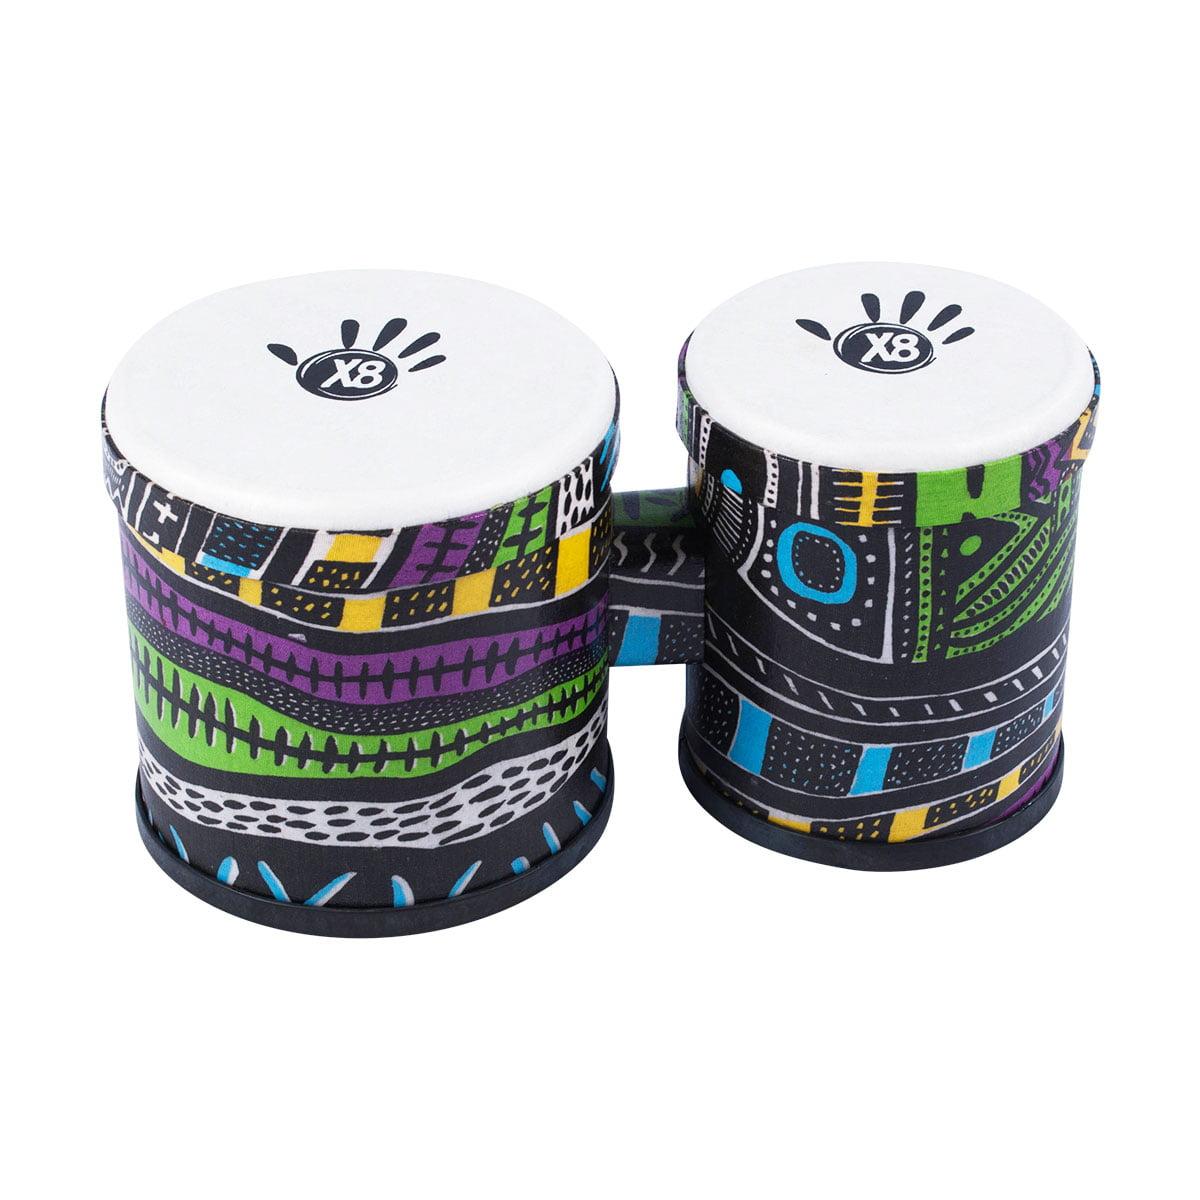 X8 Drums Island Kids Bongos by X8 Drums